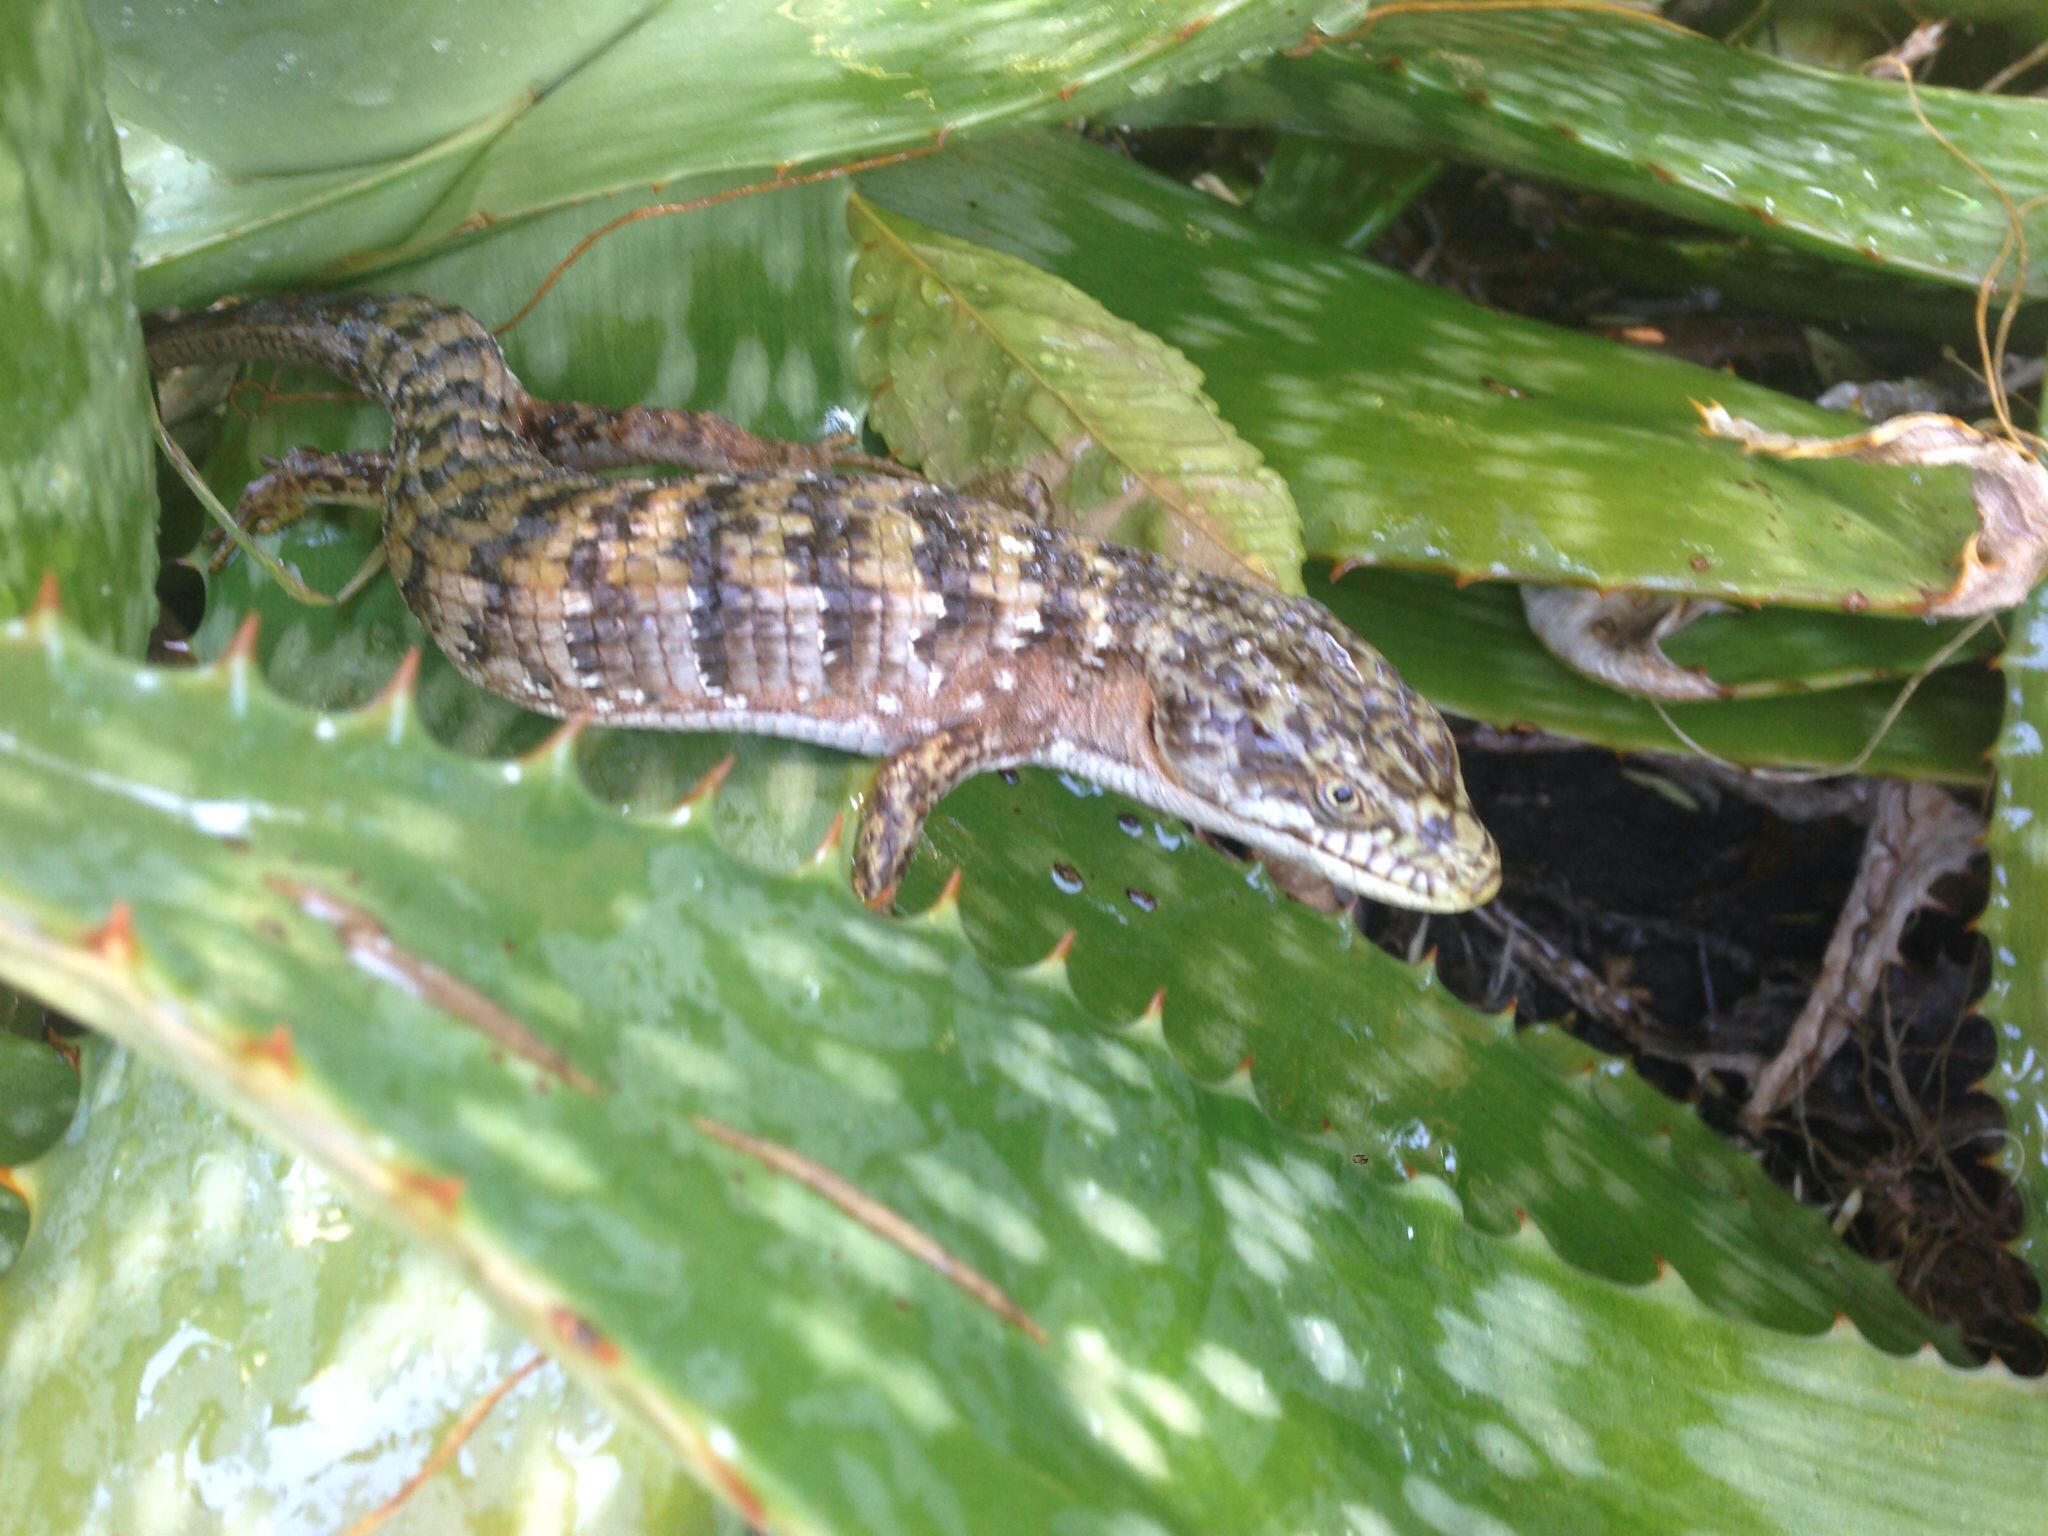 Alligator lizard | Lizard, Backyard, Animals